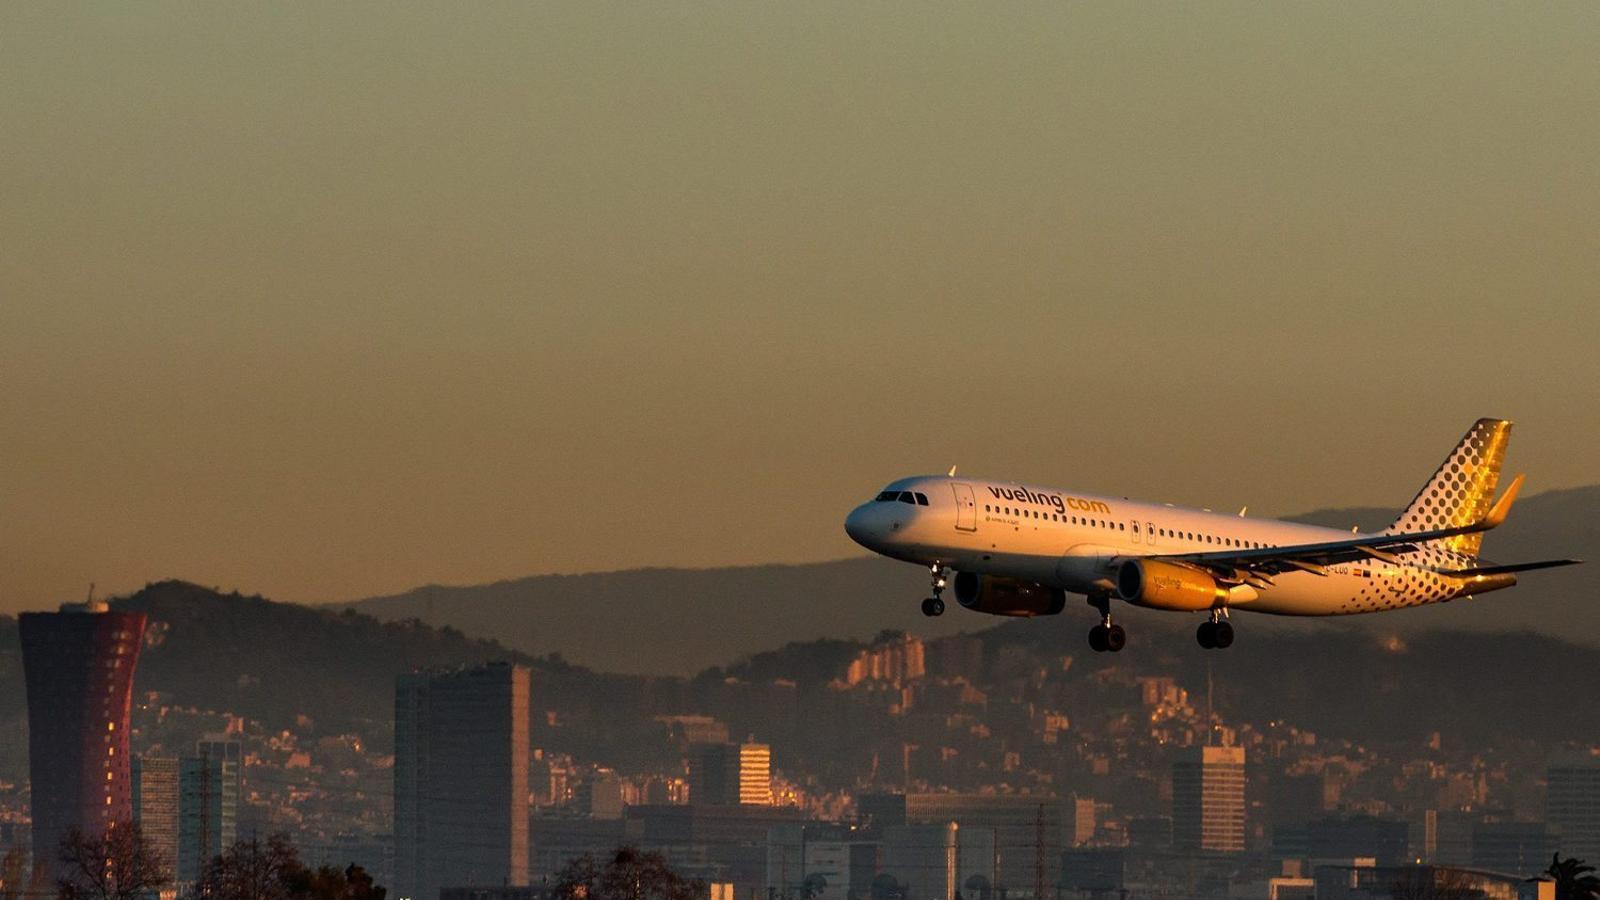 IAG integra les aerolínies Iberia, British Airways, Vueling i Aer Lingus.